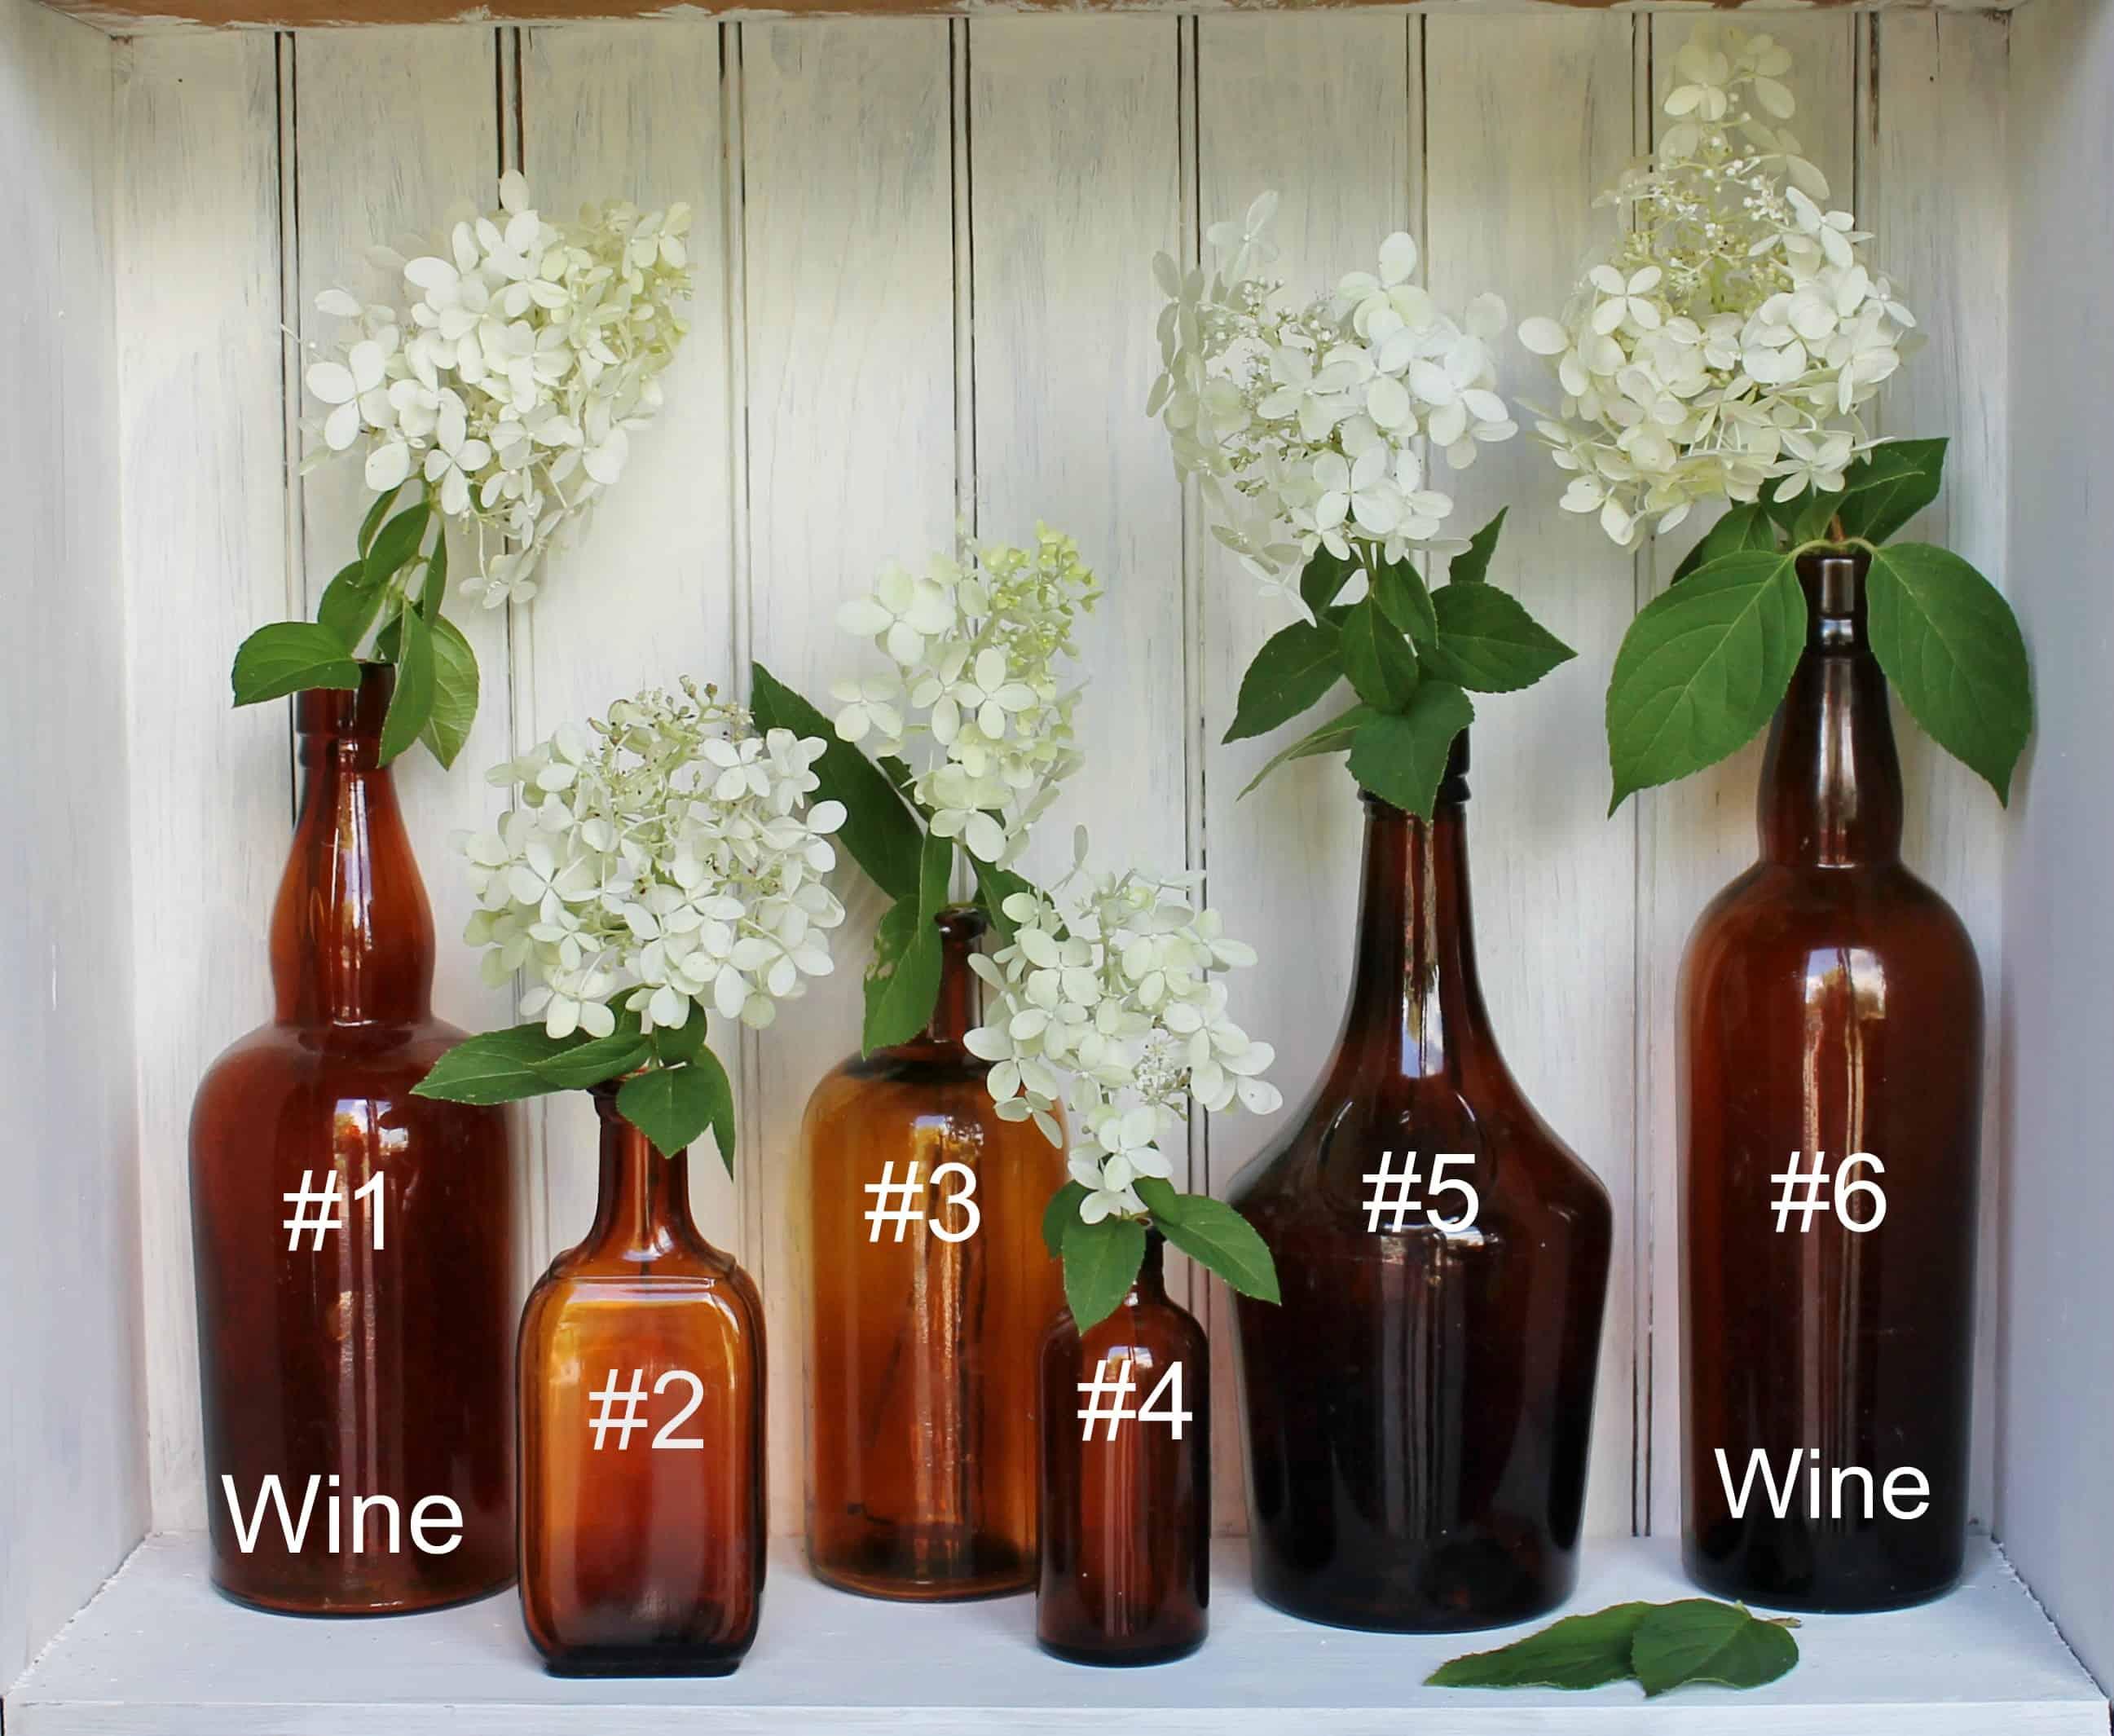 Vintage amber bottles wine bottle id and #s